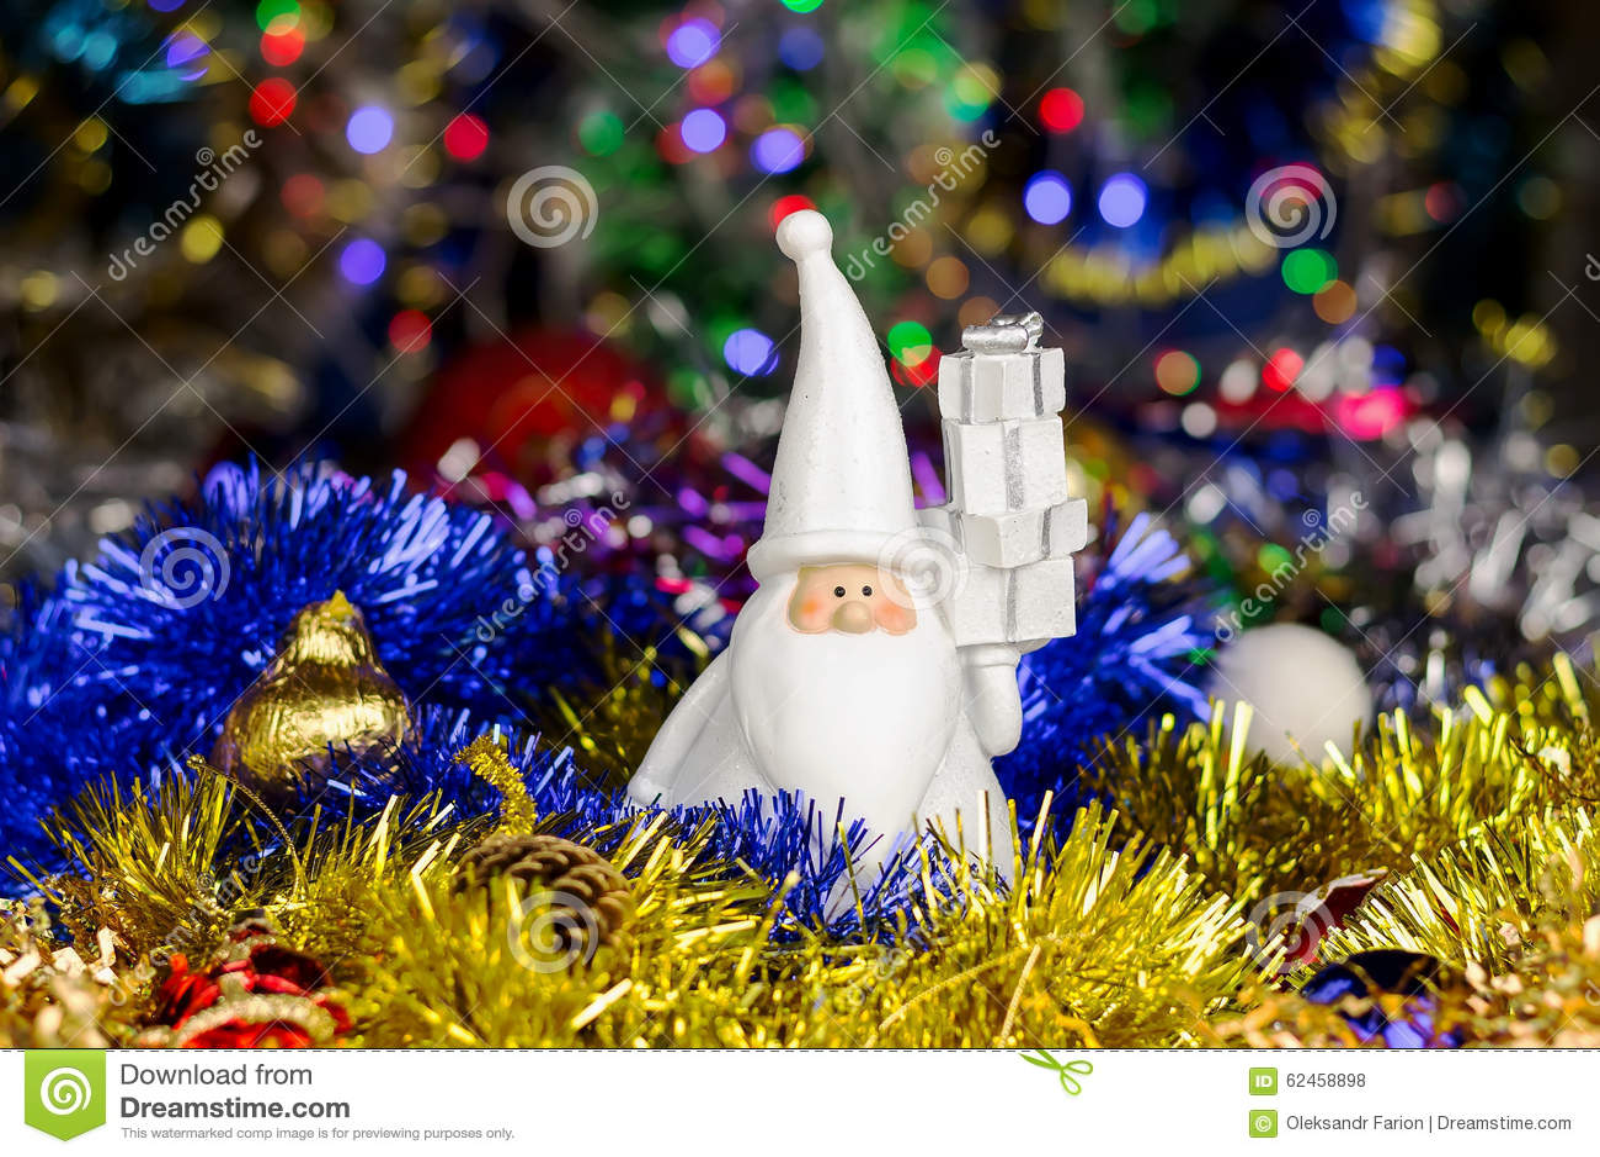 Santa figure with christmas balls tinsel on blurred